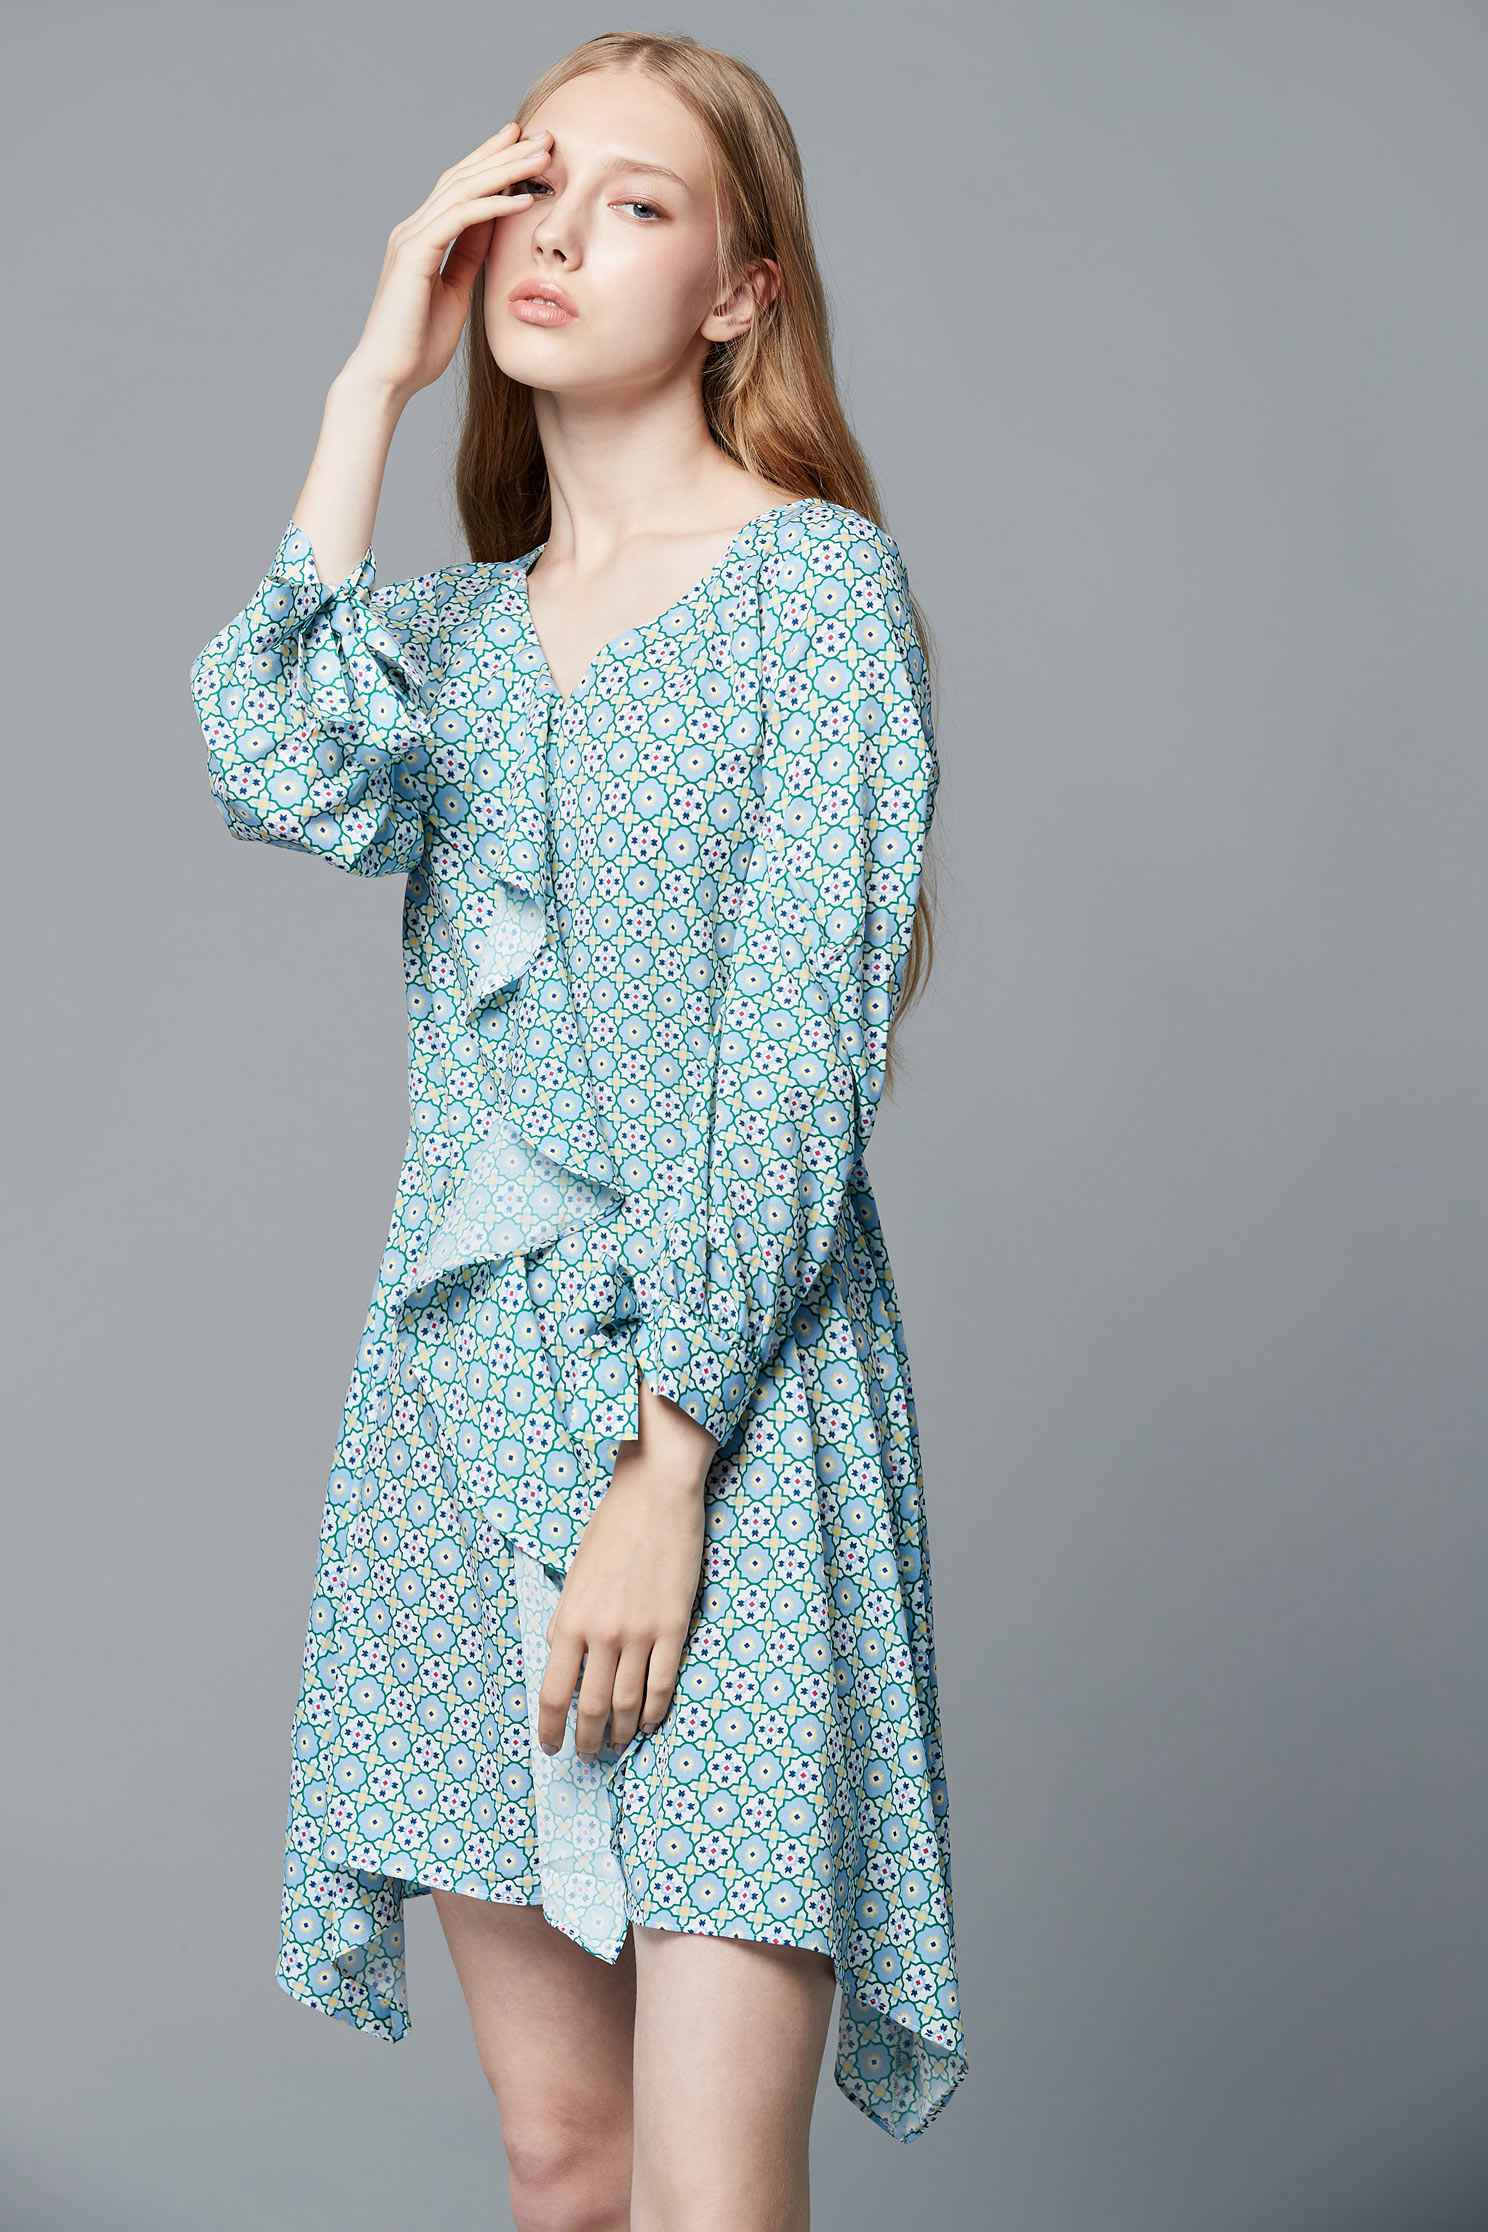 Vintage dot dress,v-neckdress,printeddress,longsleevedress